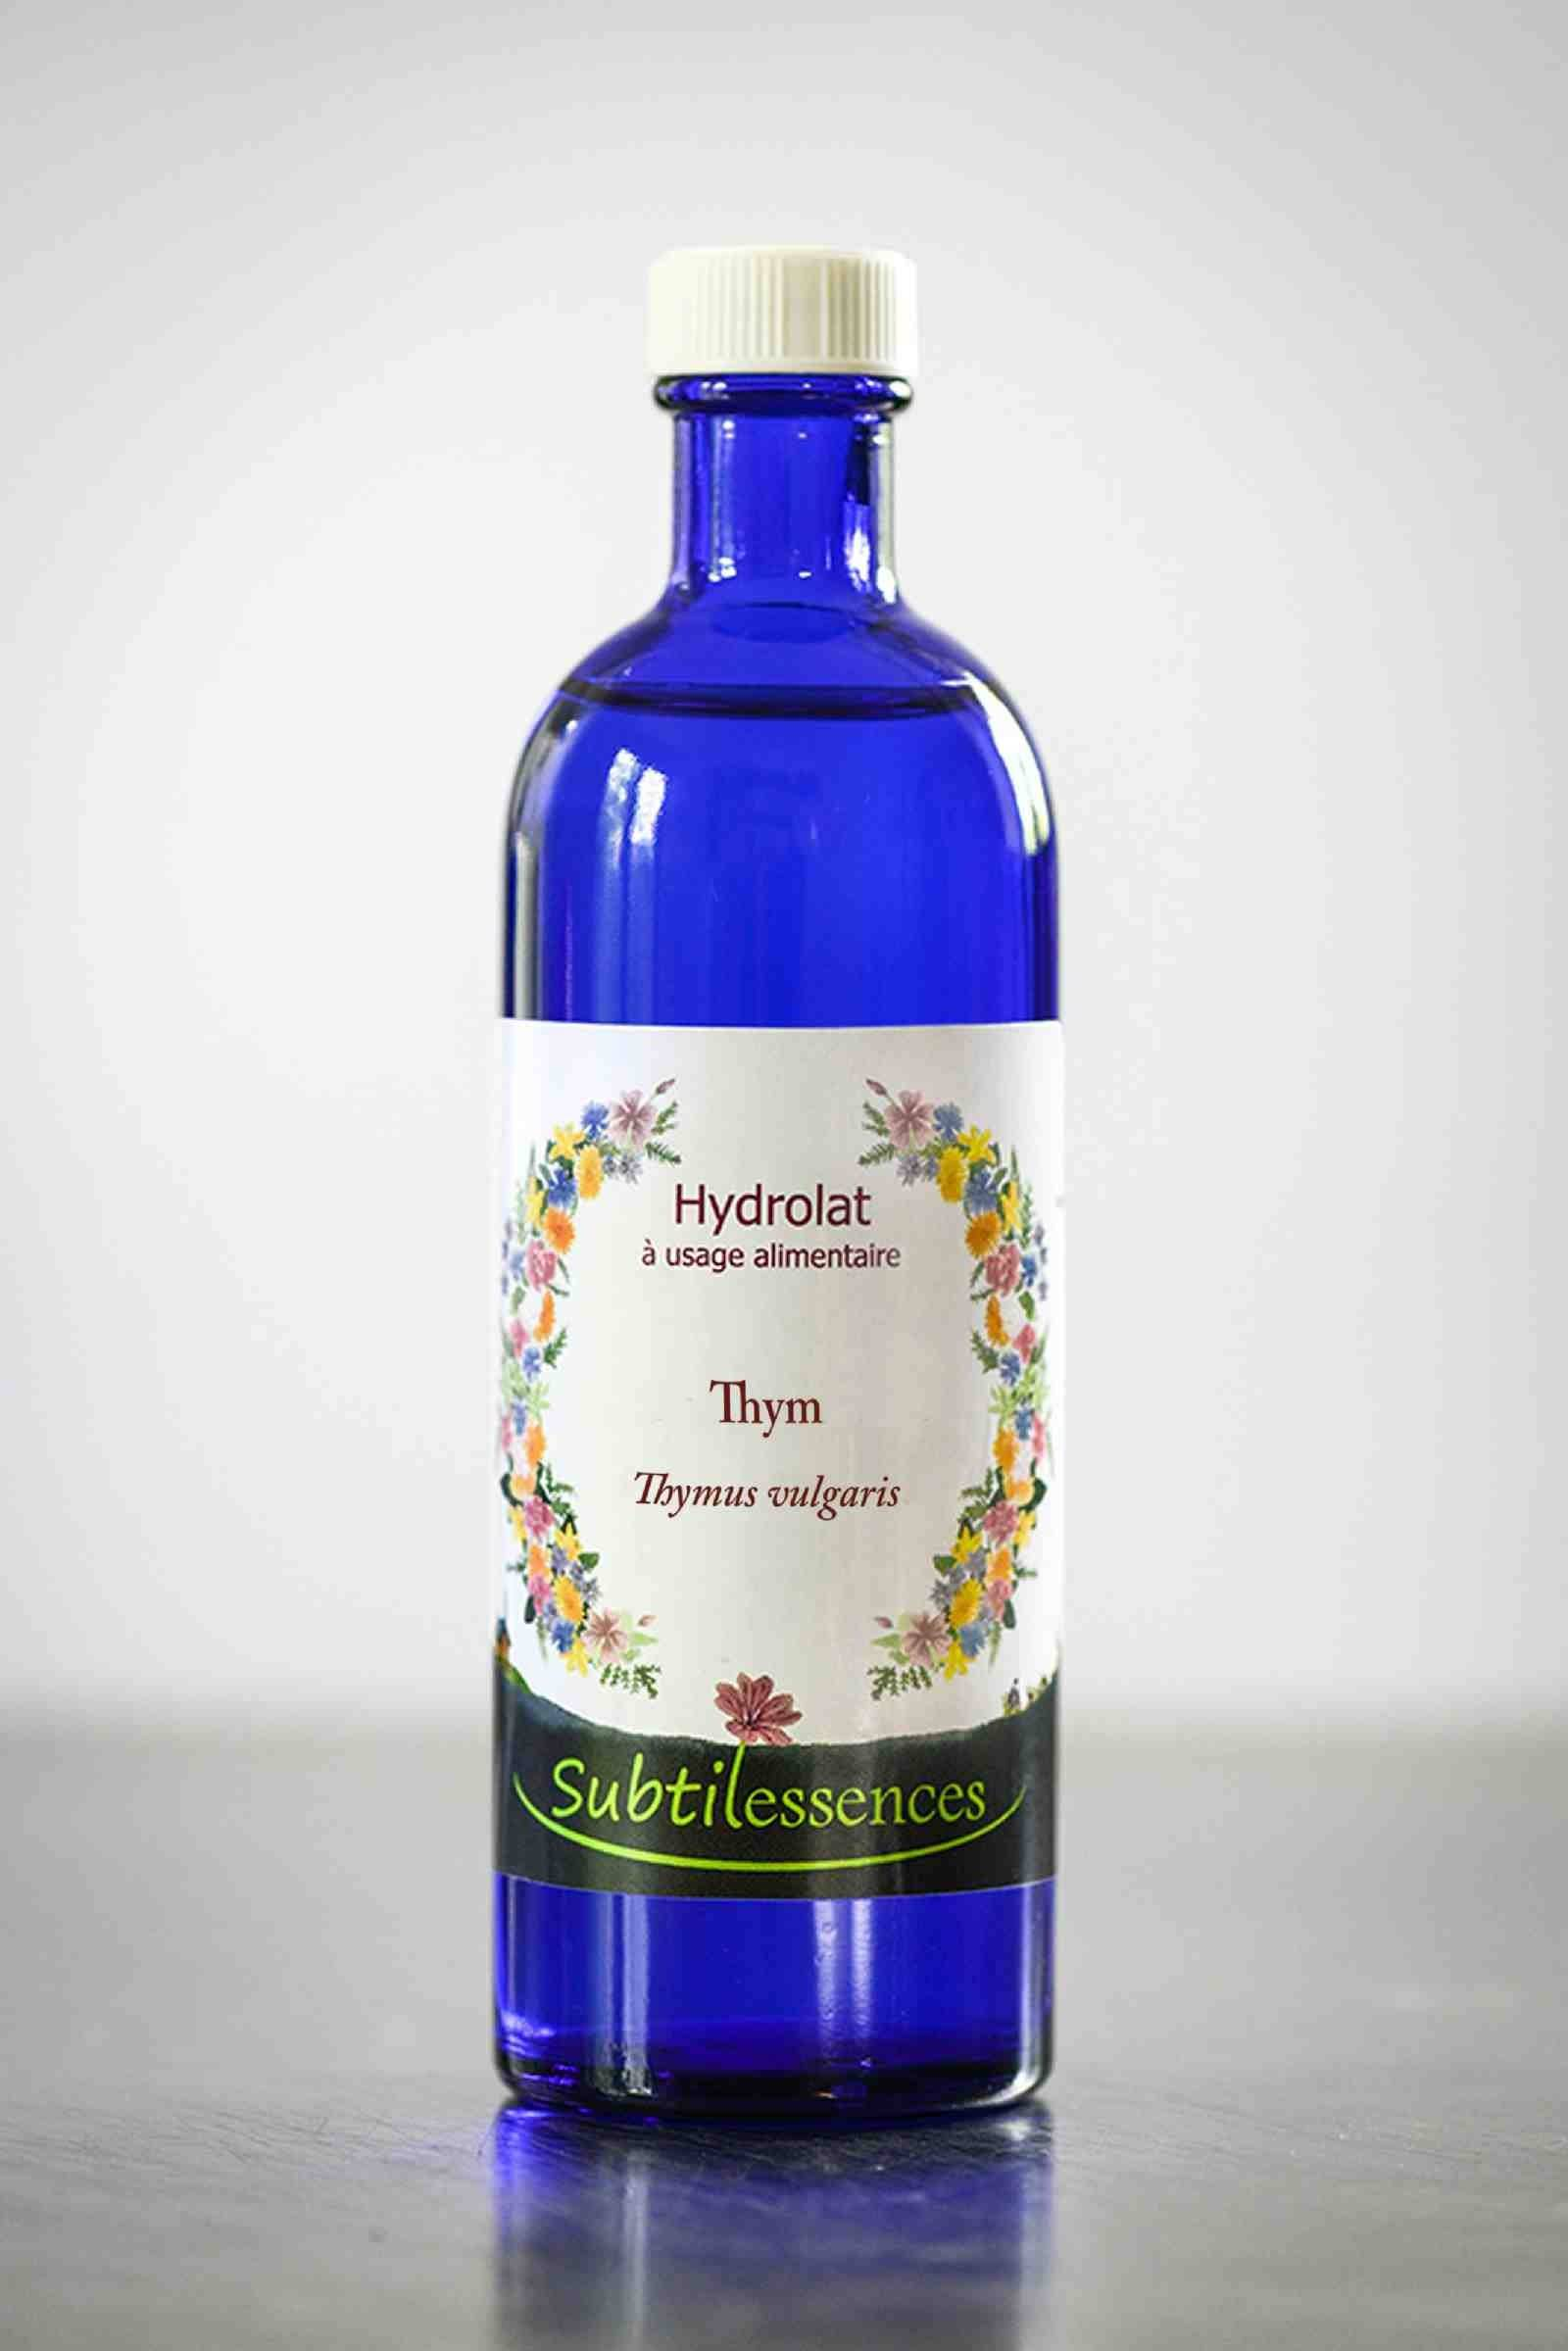 Hydrolats & eaux florales Hydrolat de Thym Carvacrol (Thymus Vulgaris carvacroliferum) - Eau florale